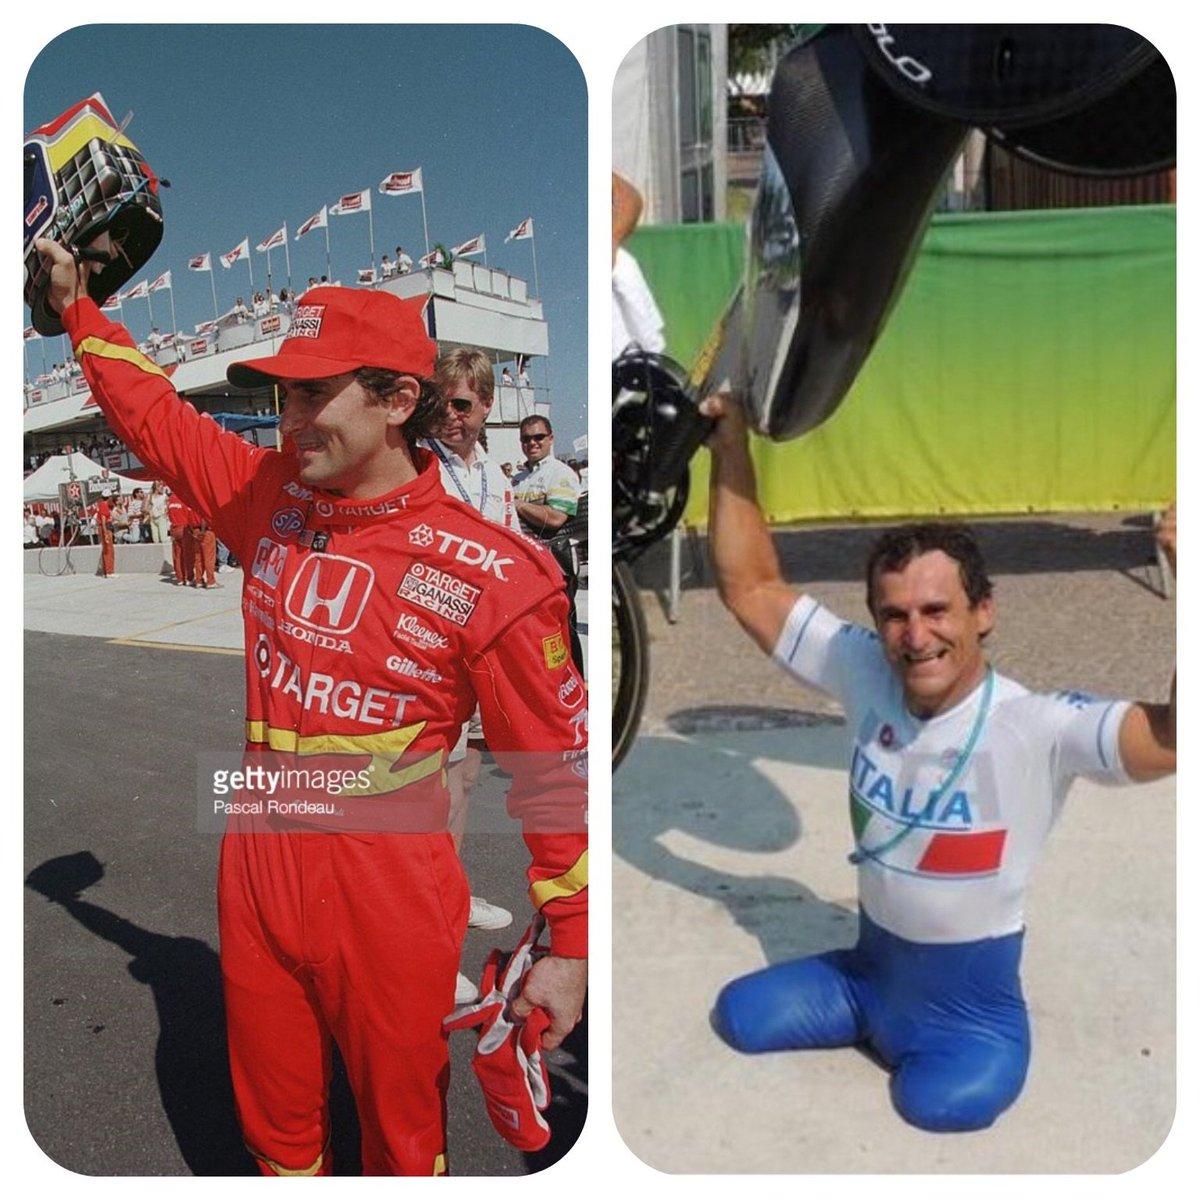 Rio de Janeiro, 1996: Zanardi pole na Indy Rio de Janeiro, 2016: Zanardi ouro na Paralimpíada https://t.co/CIcZdSdWeo